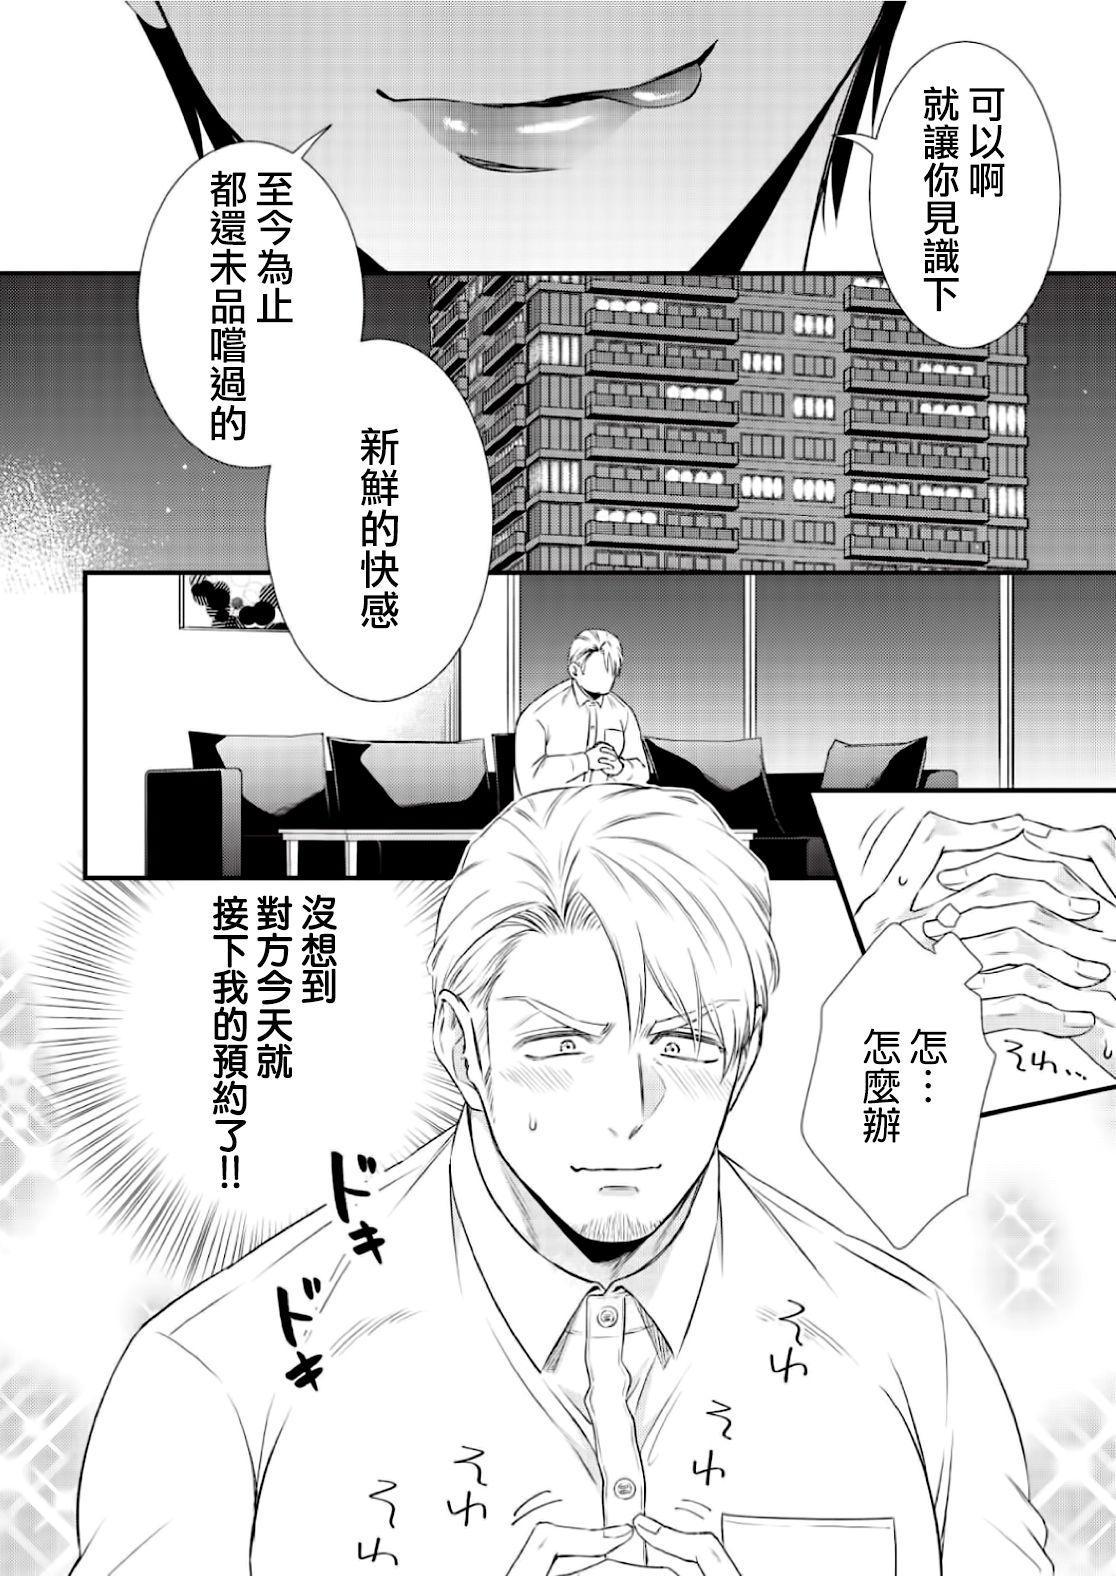 [Aion Kiu] Ijimete Kudasai Omega-sama ch.1-2 [Chinese] [沒有漢化] [Digital] 12